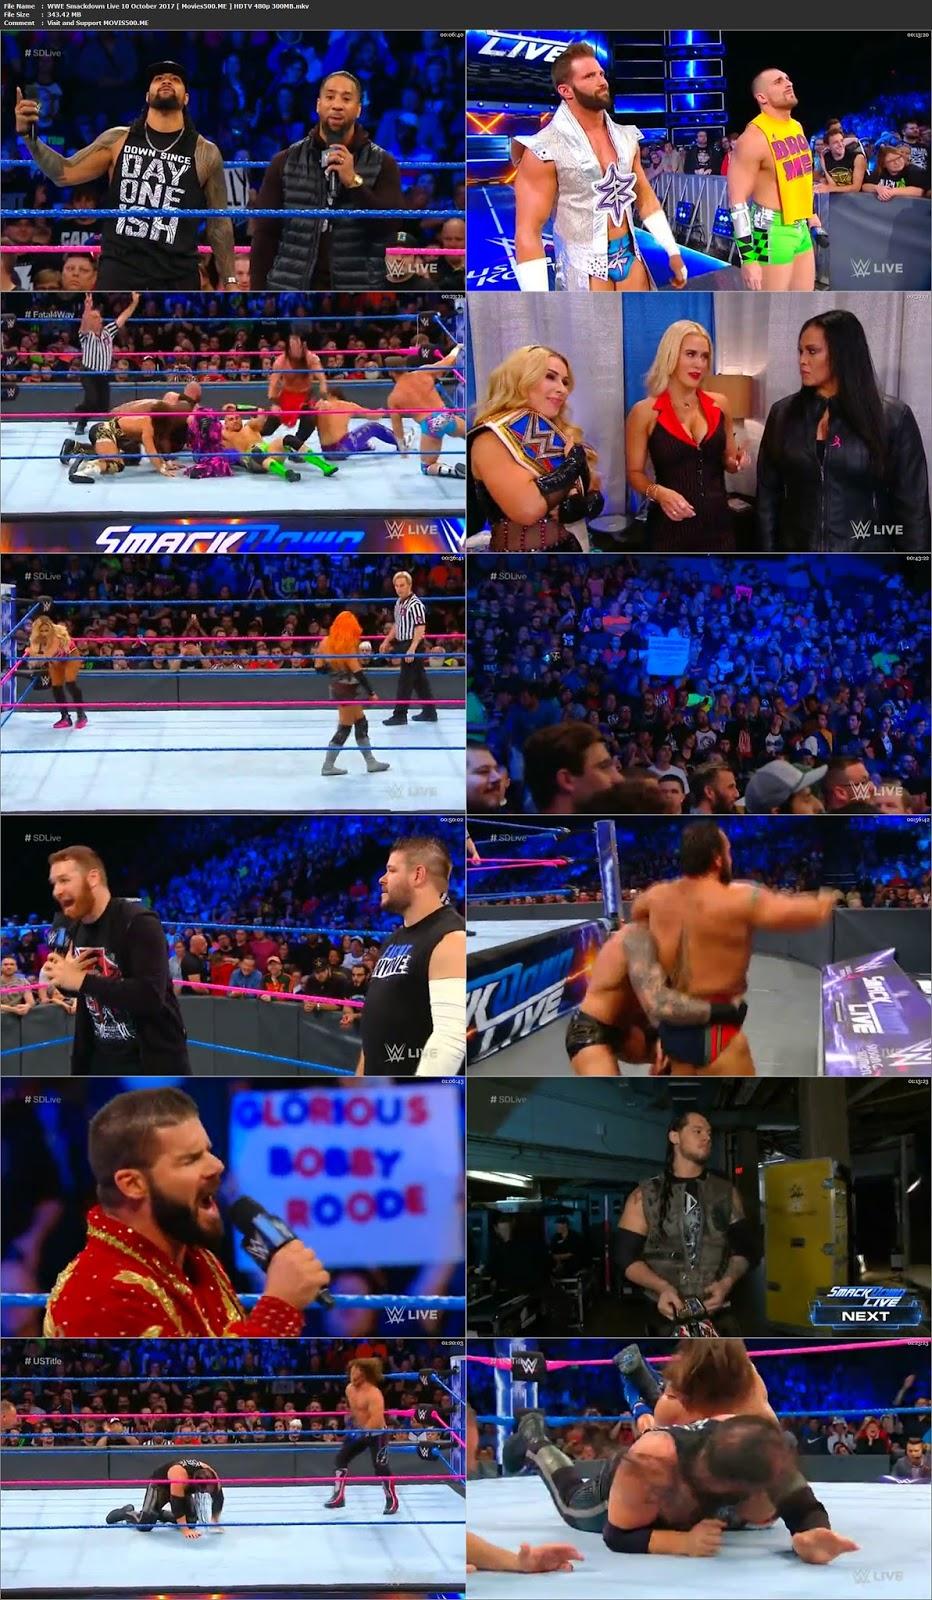 WWE Smackdown Live 10 October 2017 HDTV 343MB Download 480p at softwaresonly.com